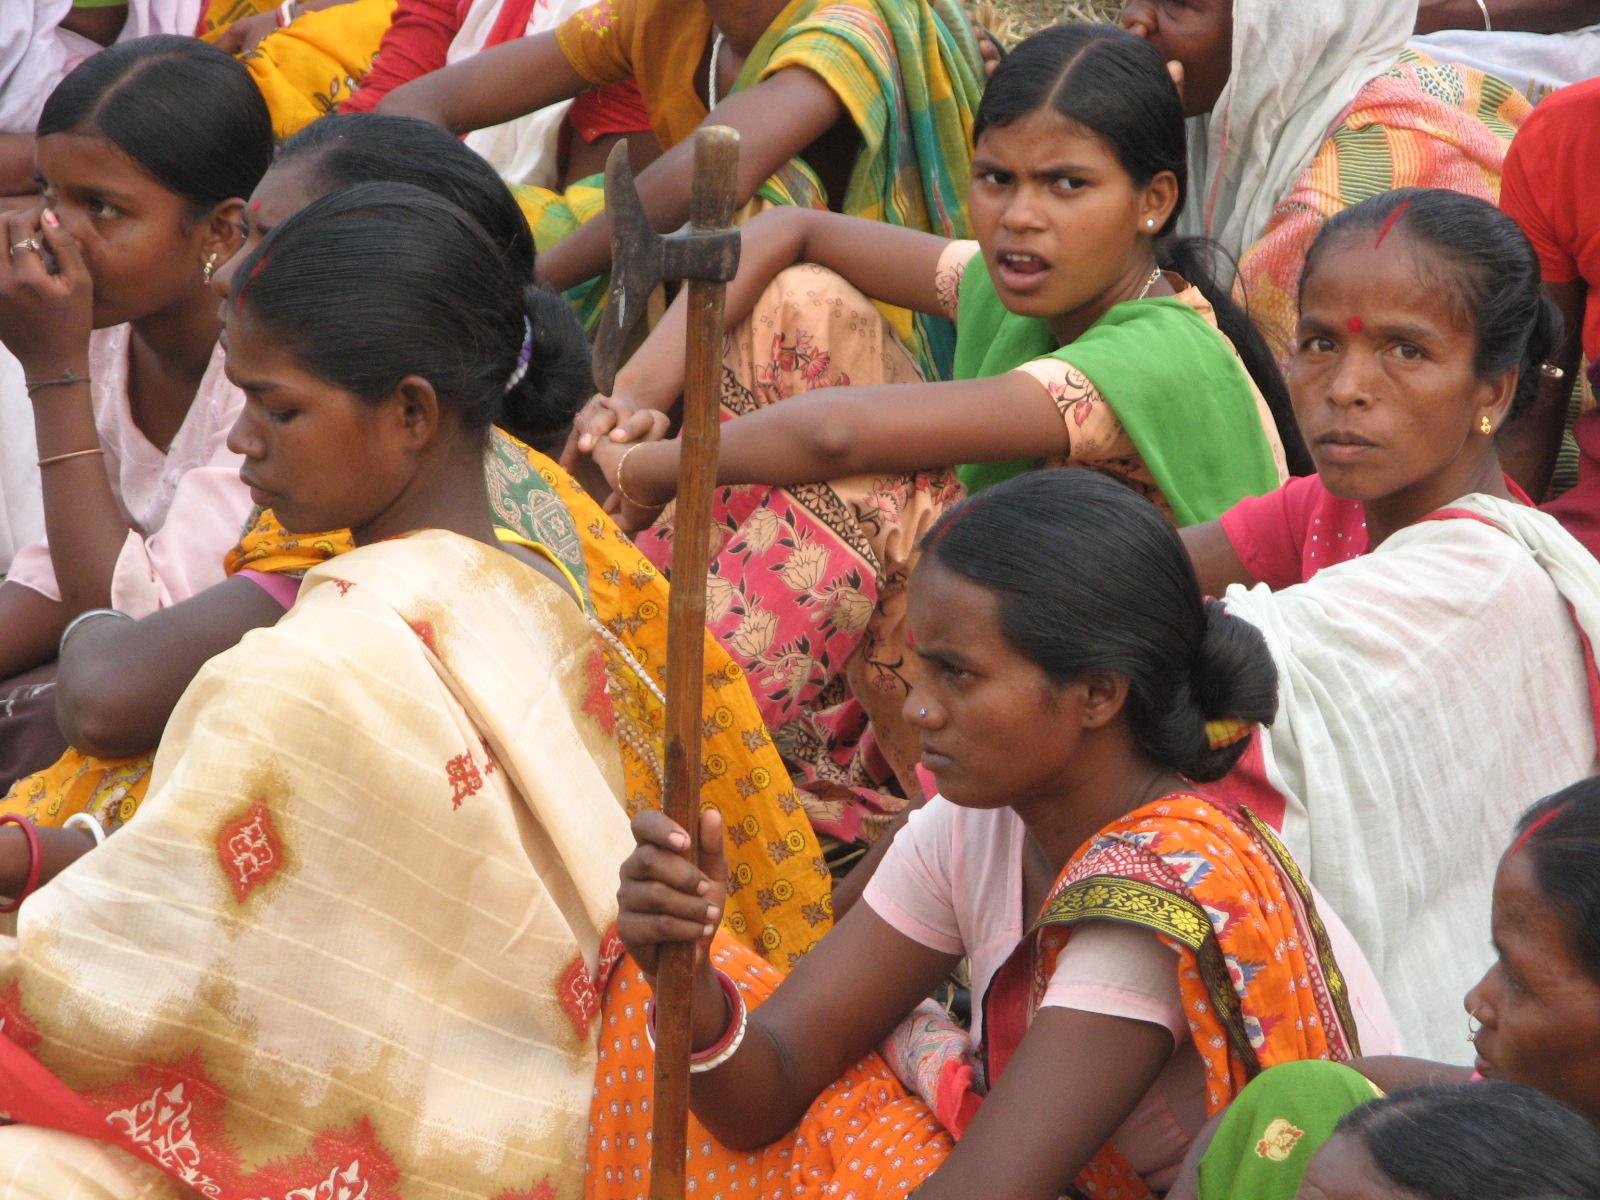 https://upload.wikimedia.org/wikipedia/commons/d/da/Lalgarh_adivasi_women.JPG